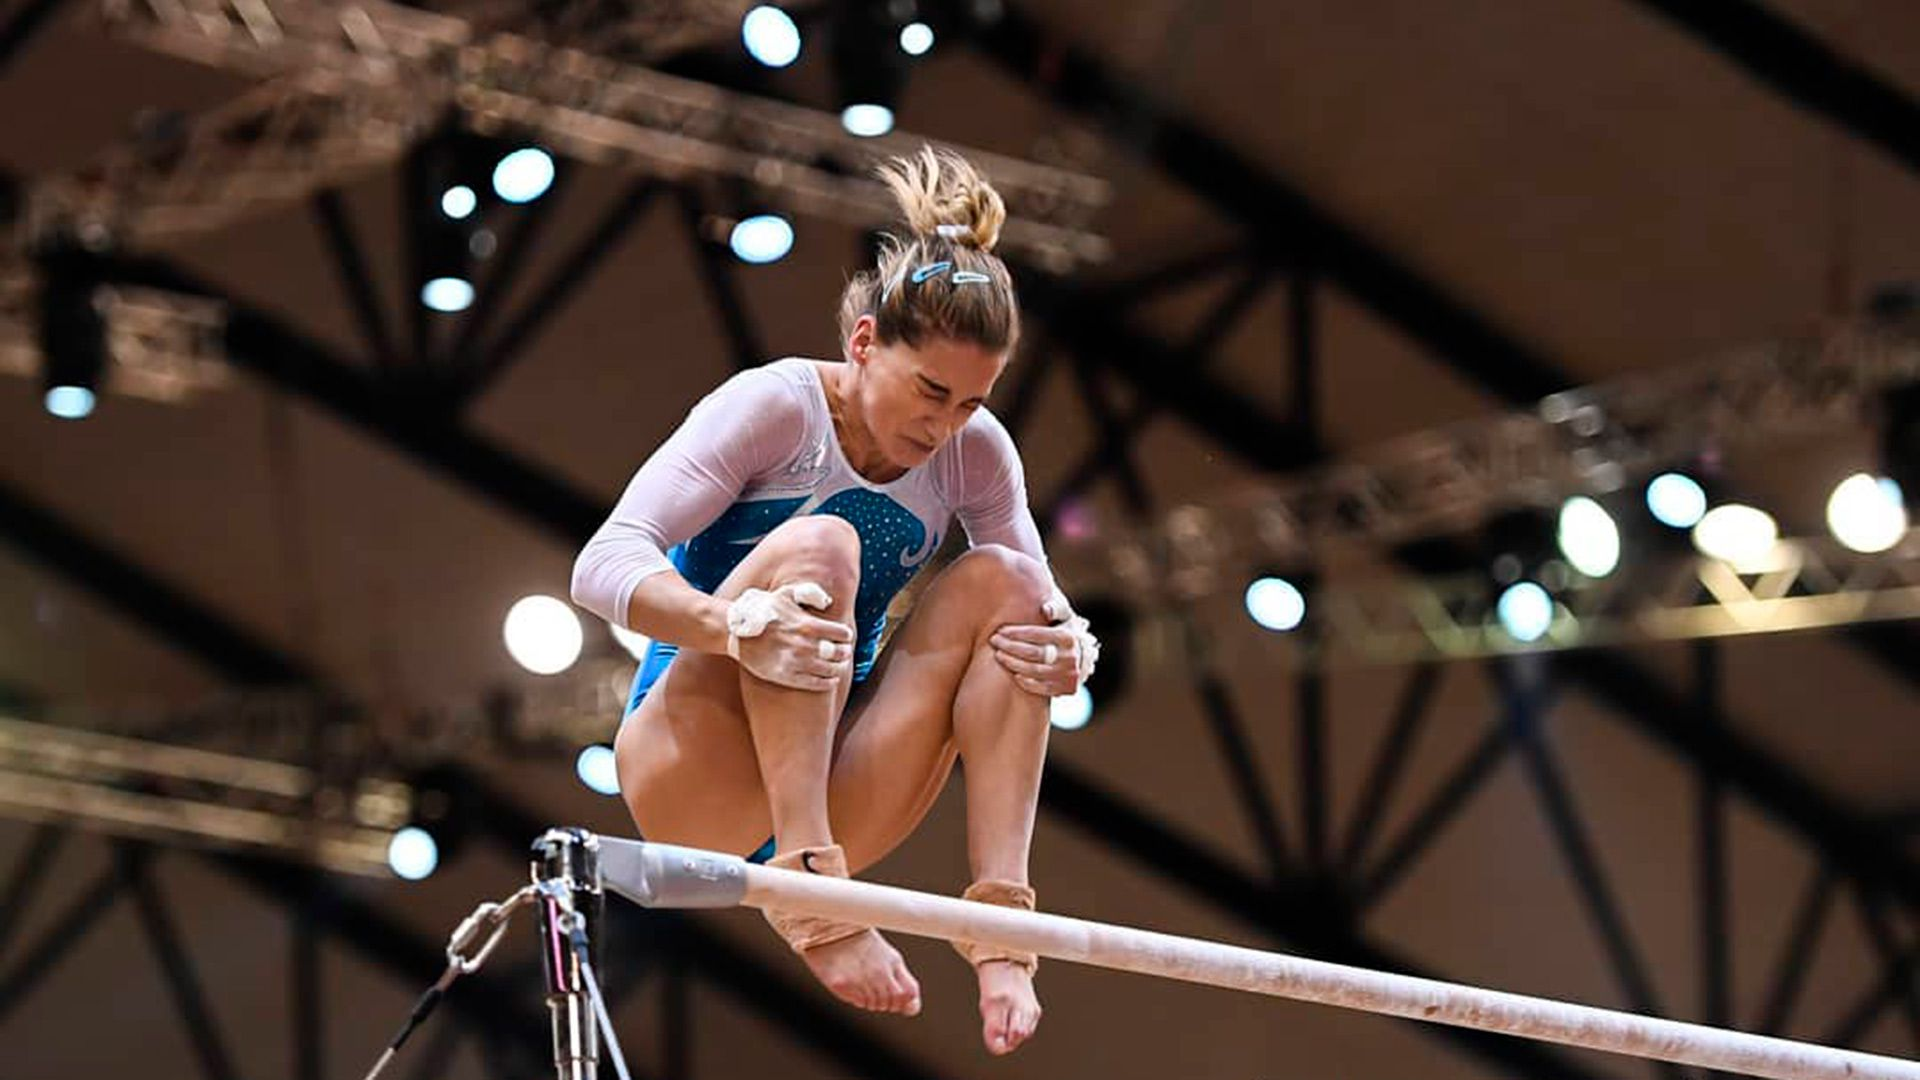 Ayelén Tarabini anunció su retiro de la gimnasia argentina